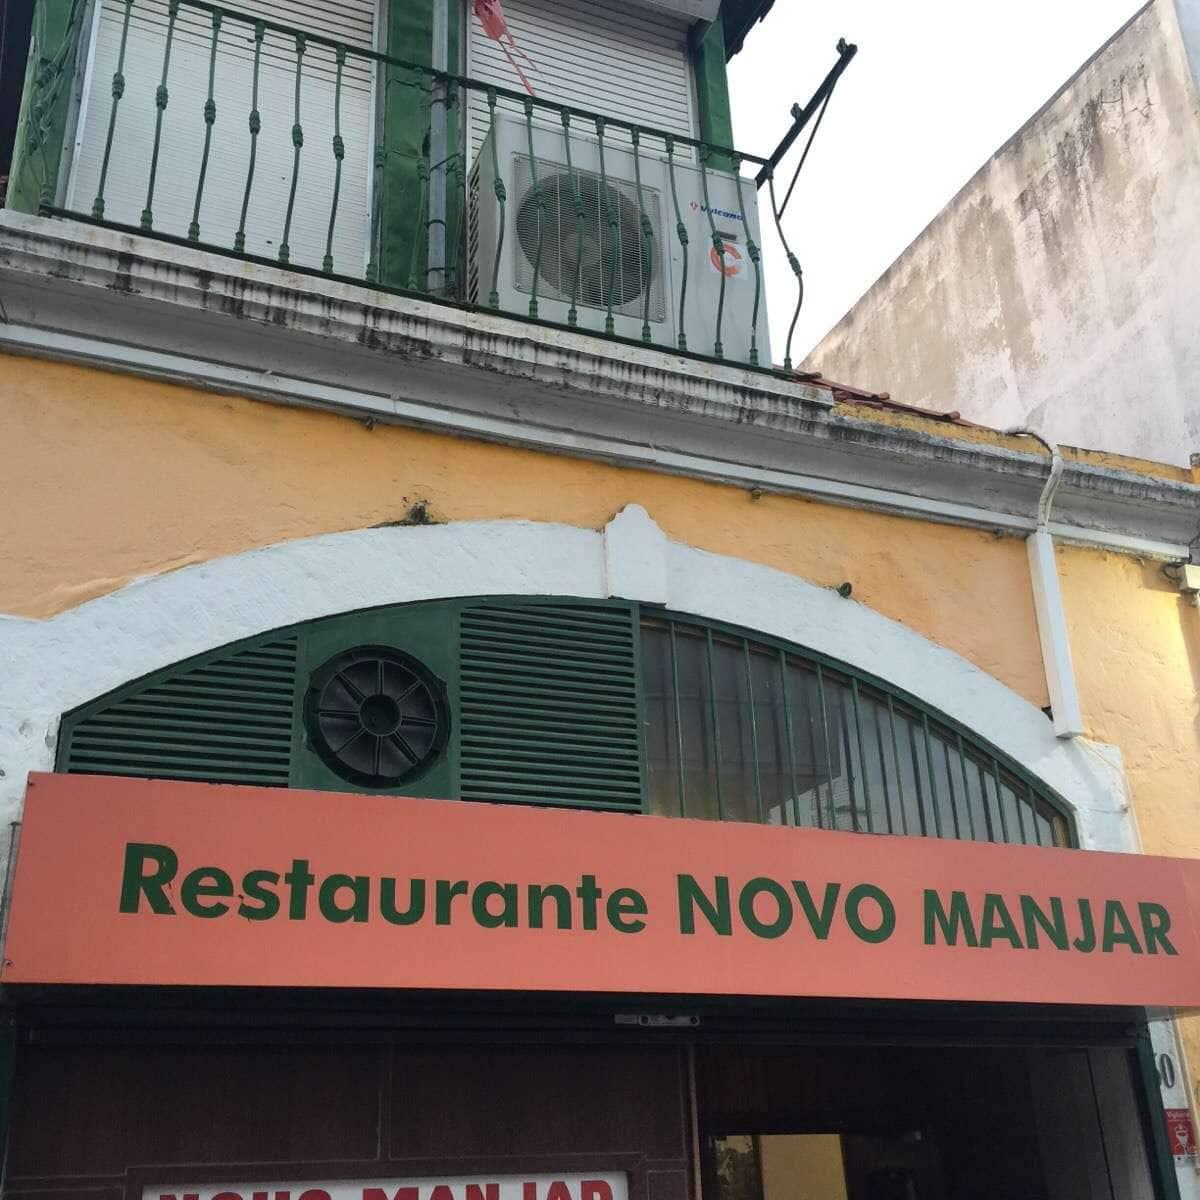 Novo Manjar